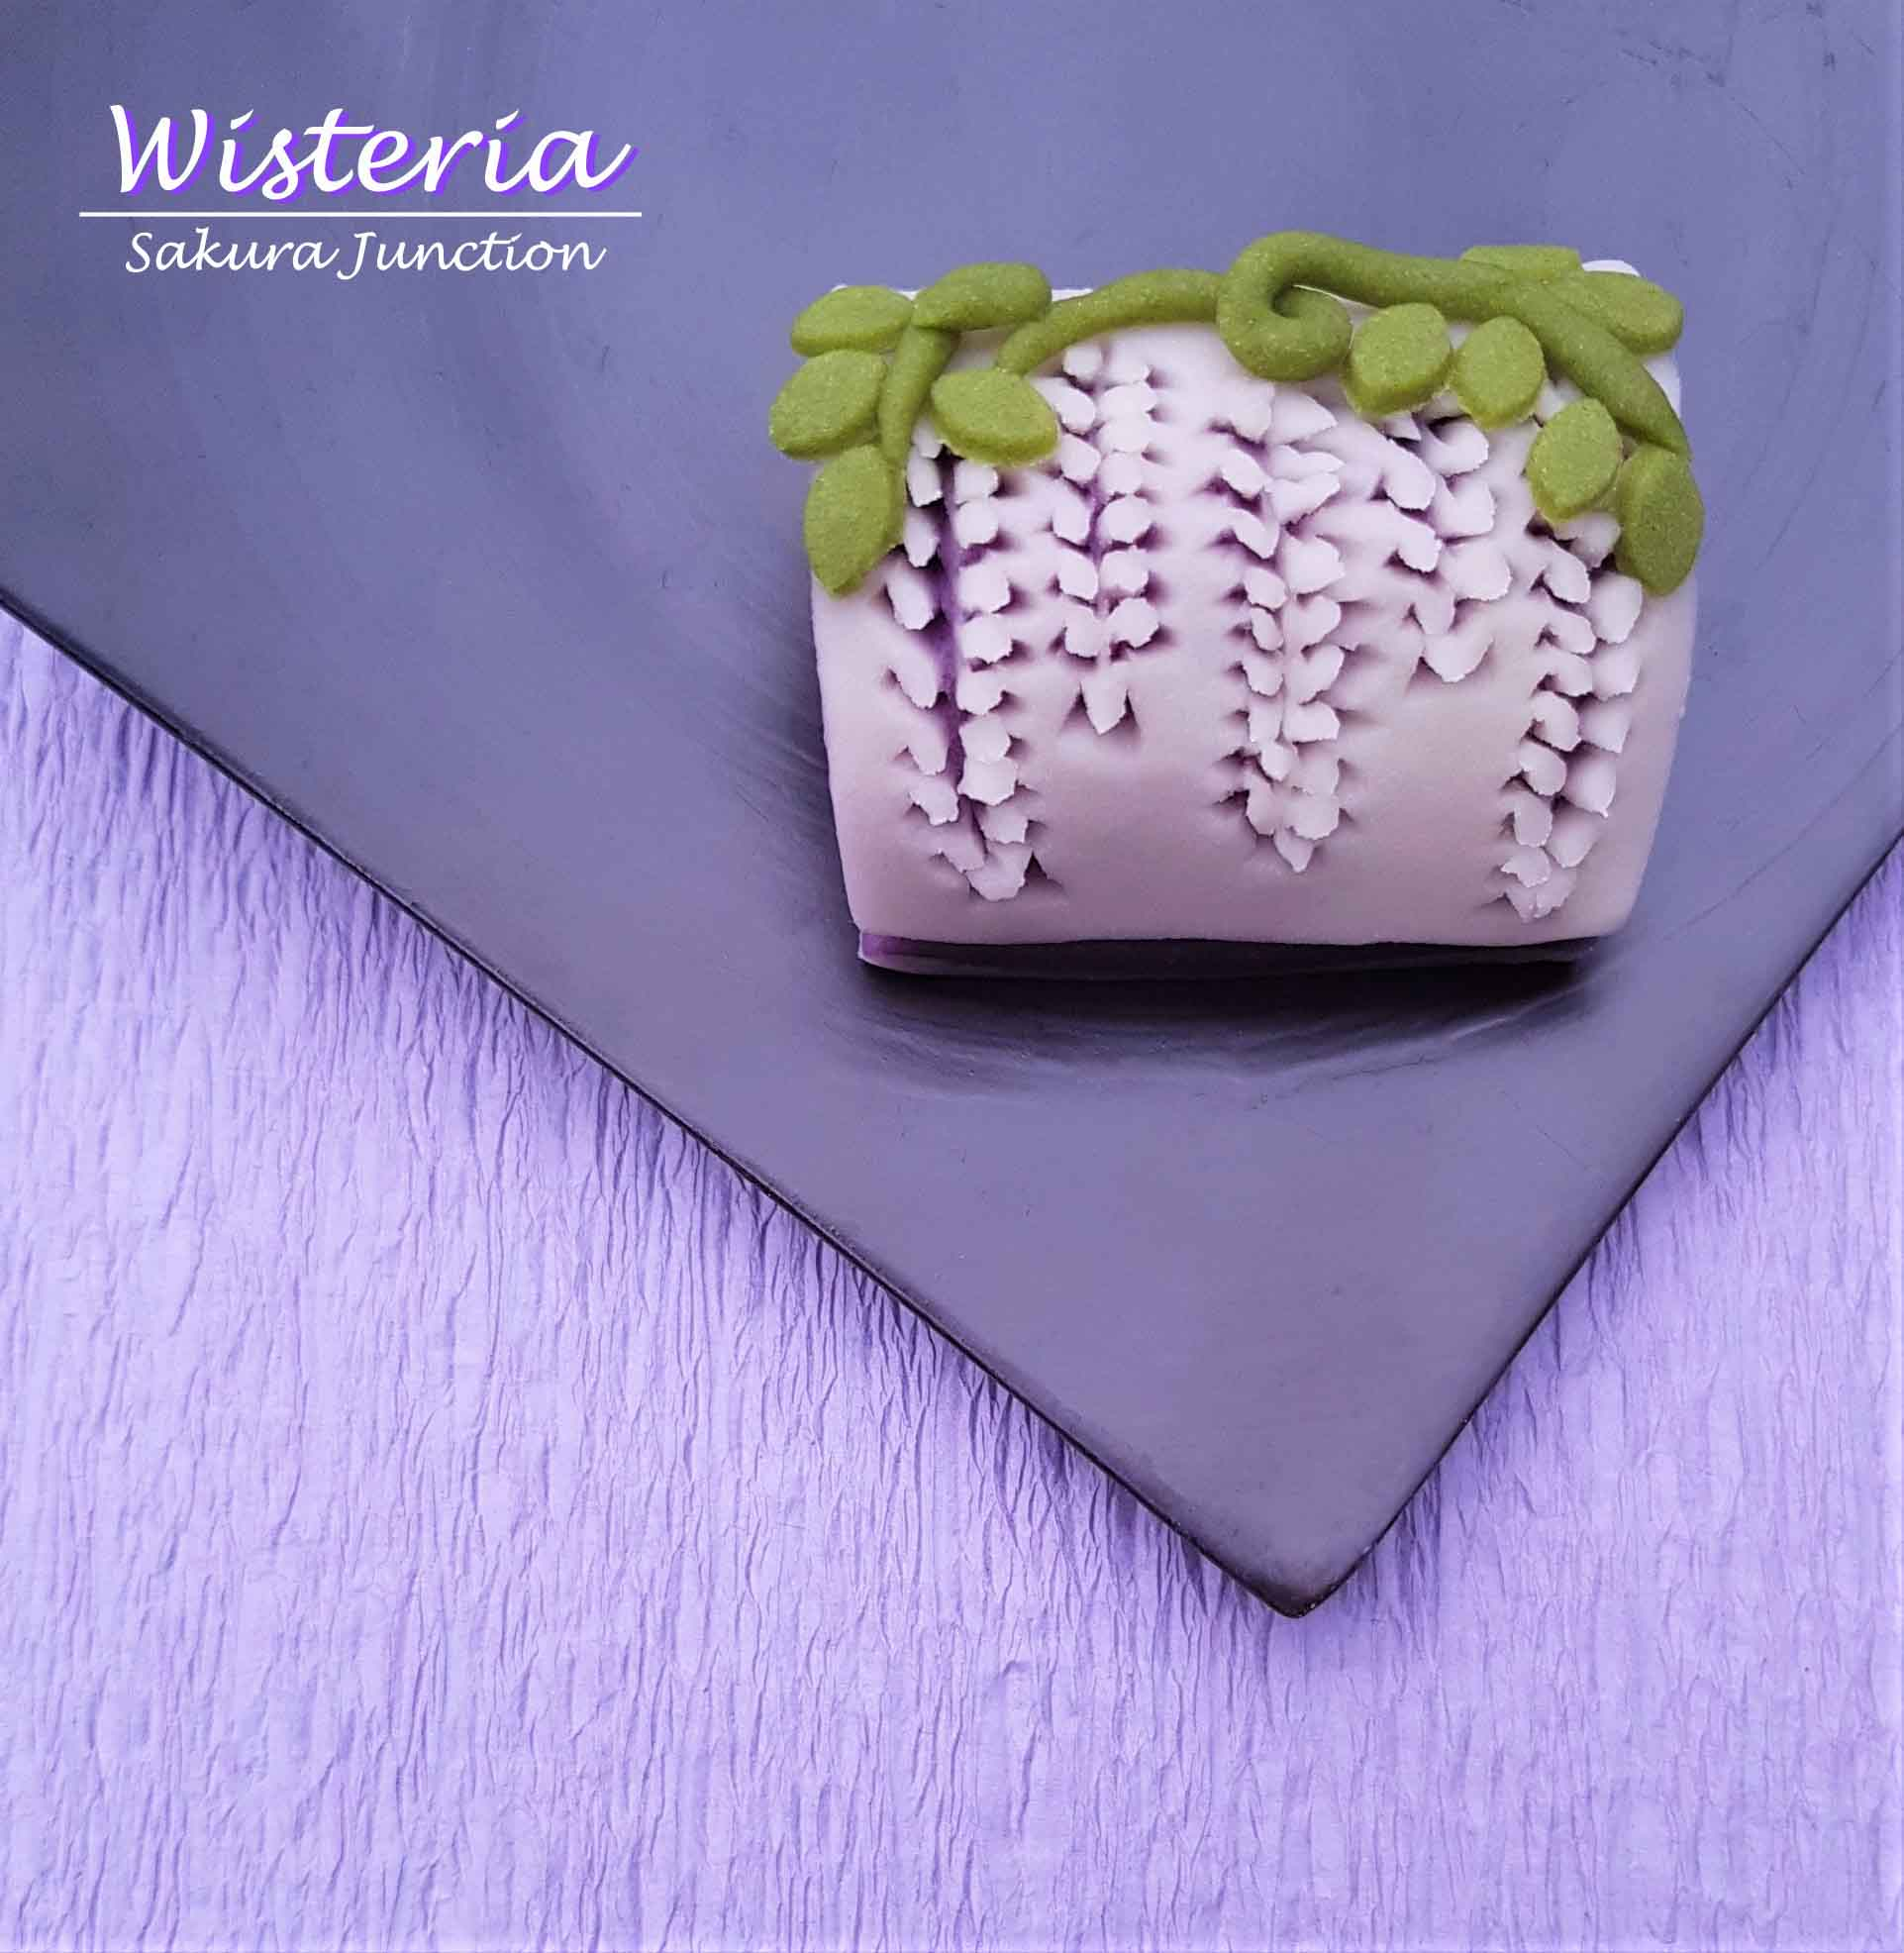 Wisteria v2-1